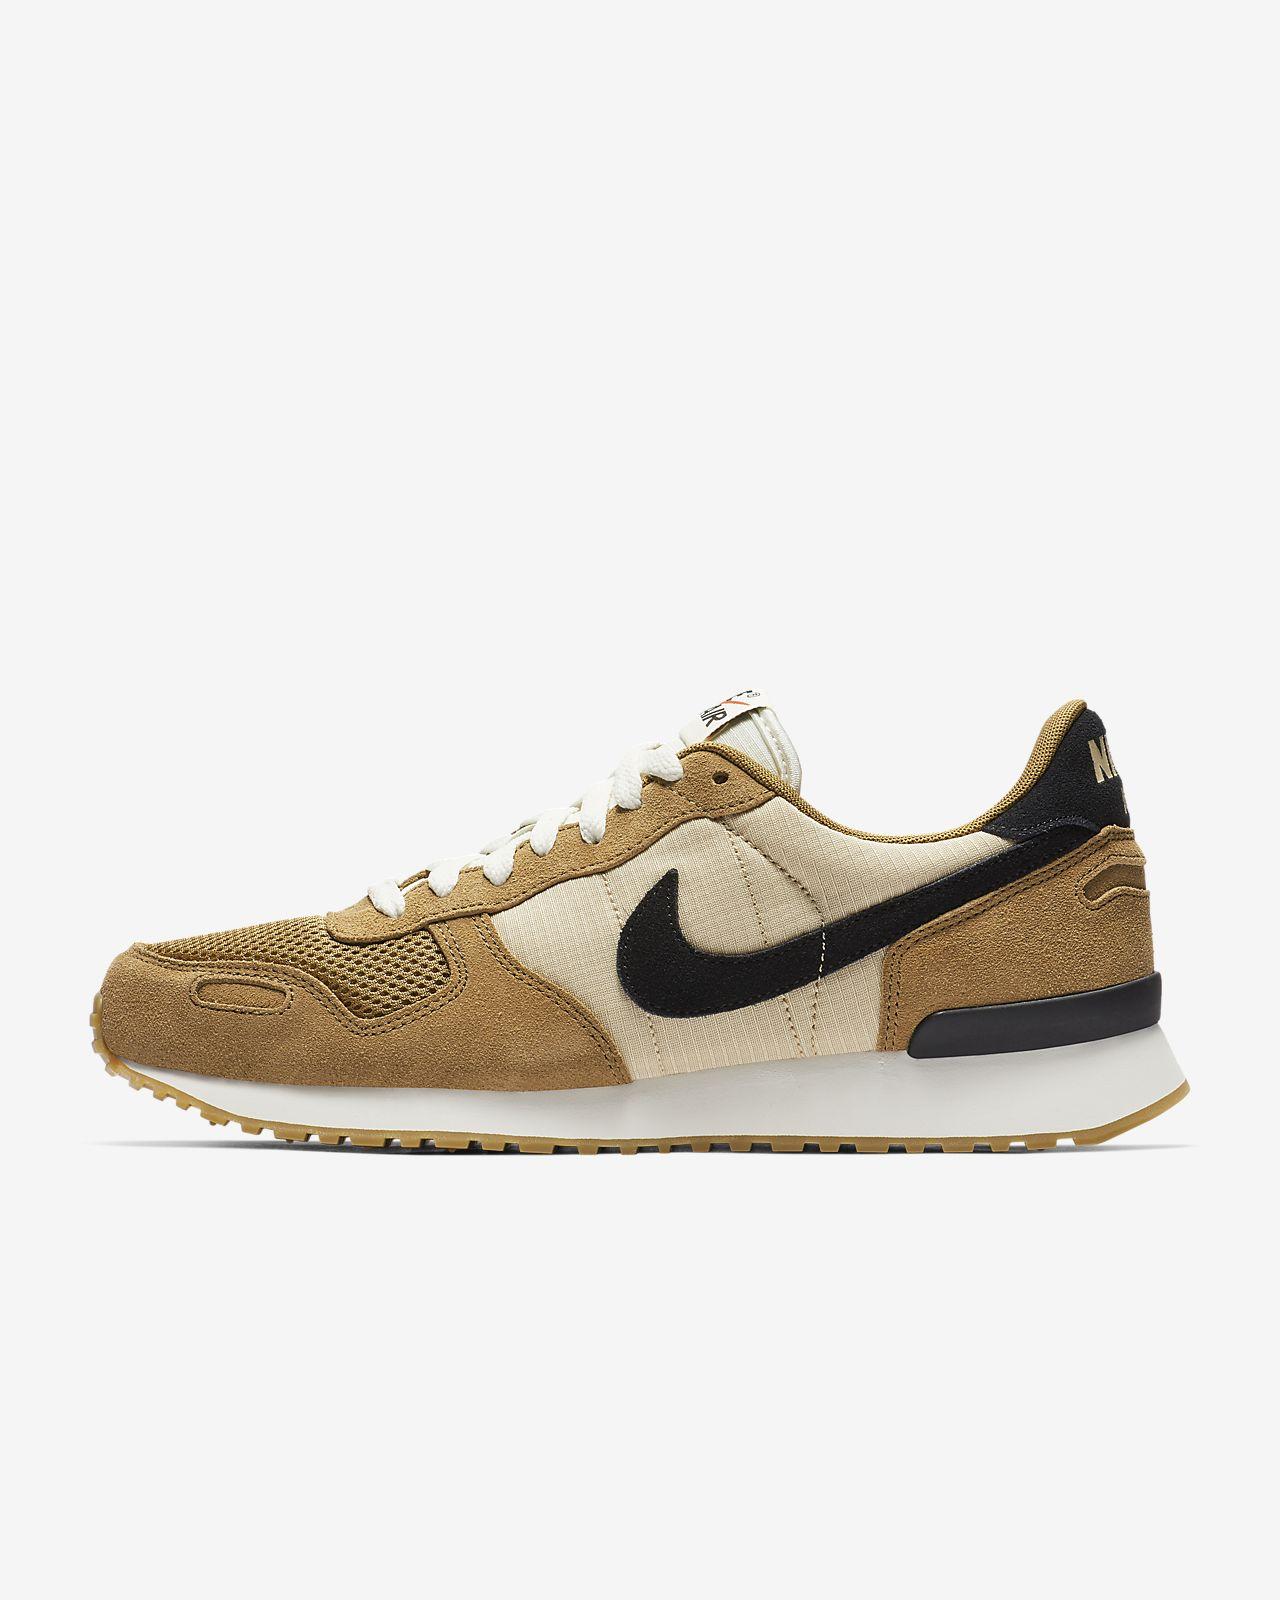 new arrival 21765 c4176 ... Chaussure Nike Air Vortex pour Homme